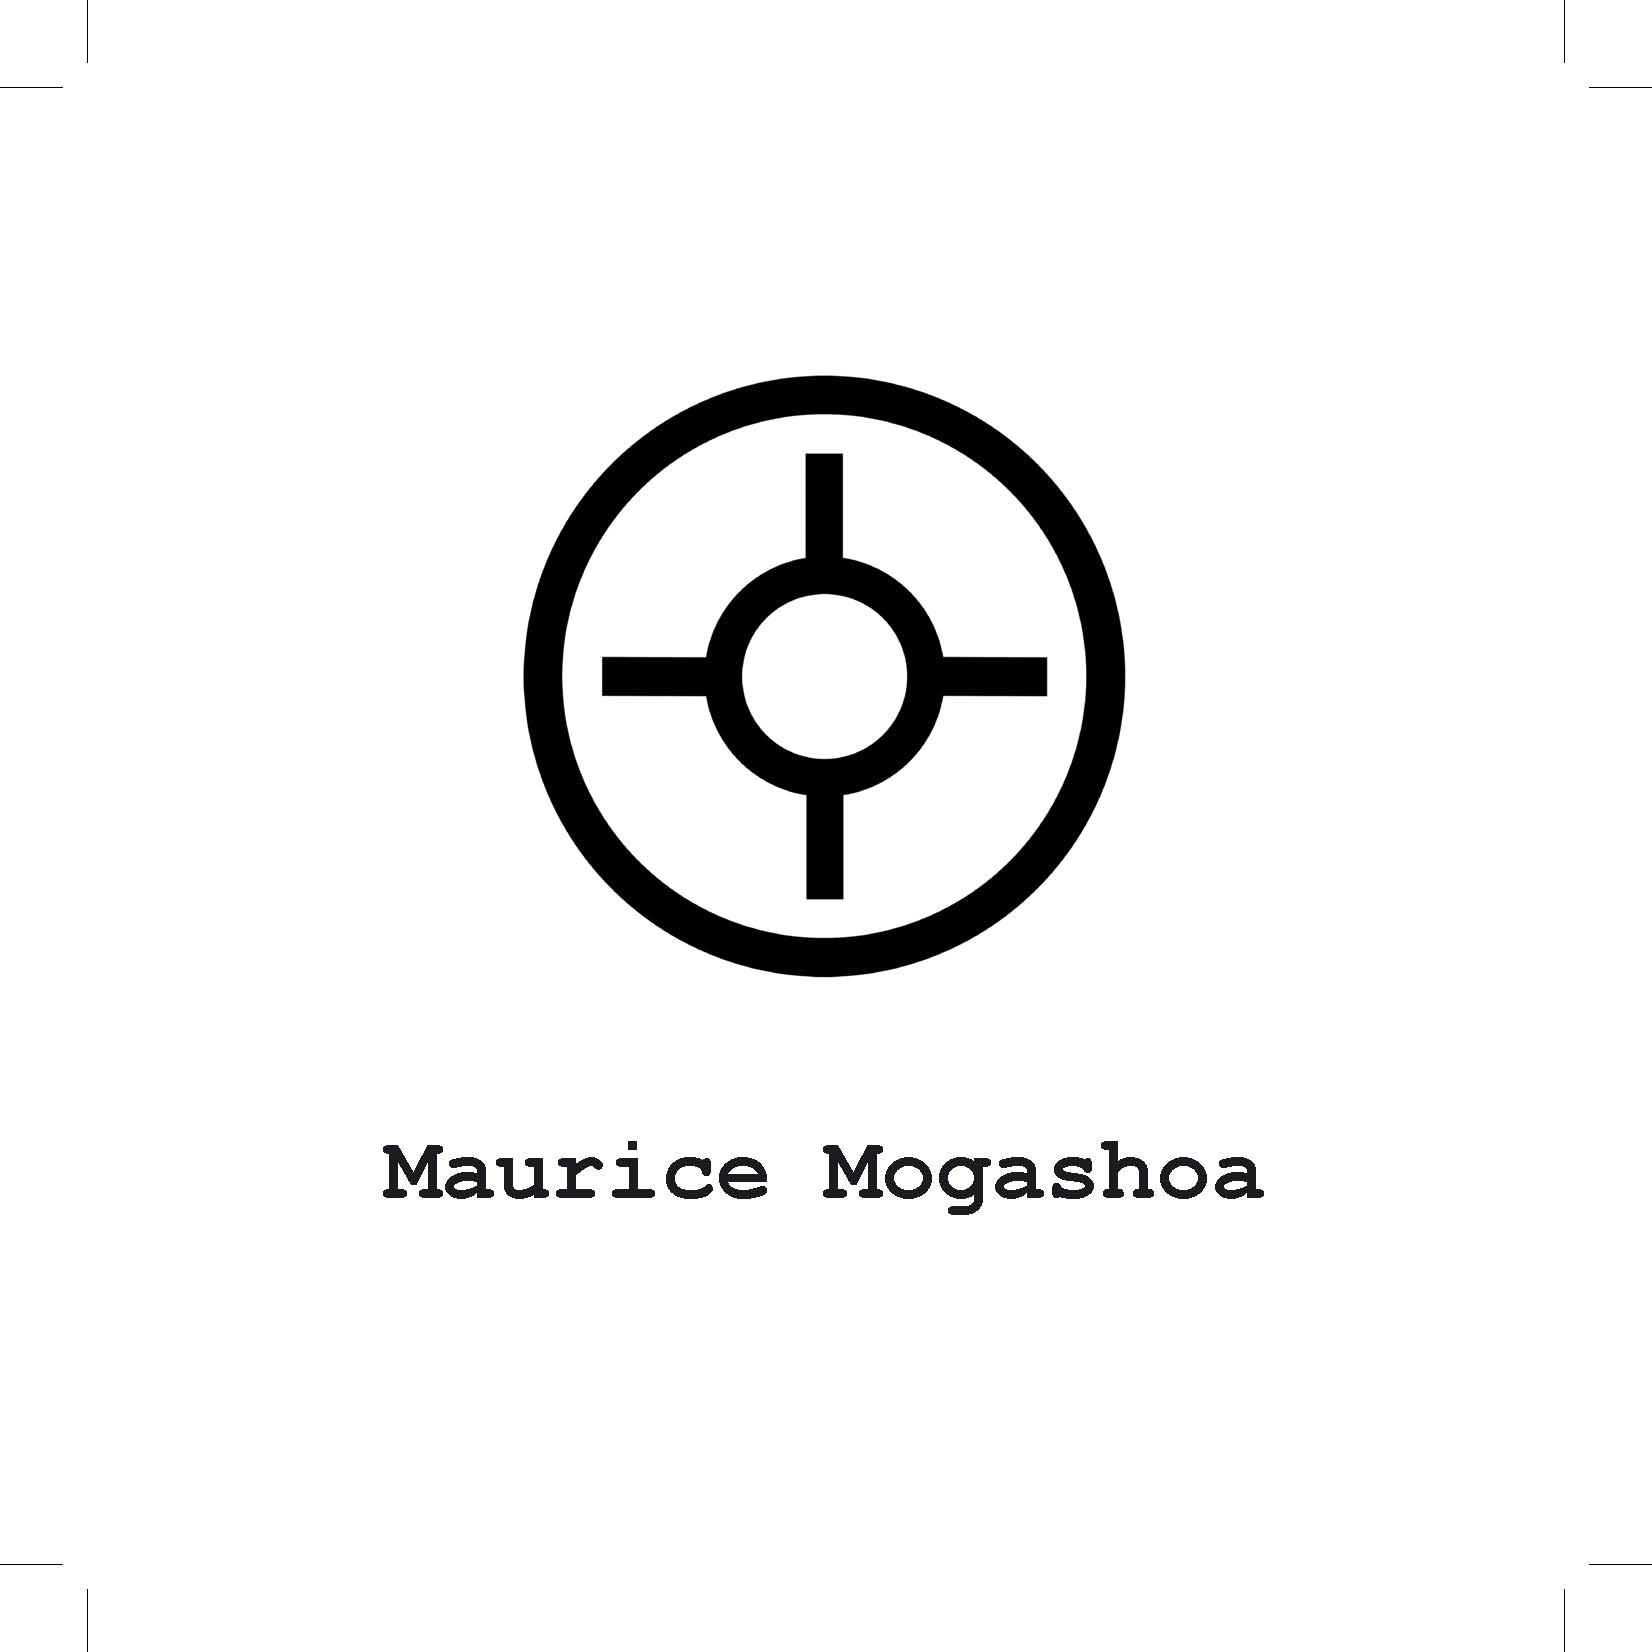 MAP Southafrica - Maurice Mogashoa